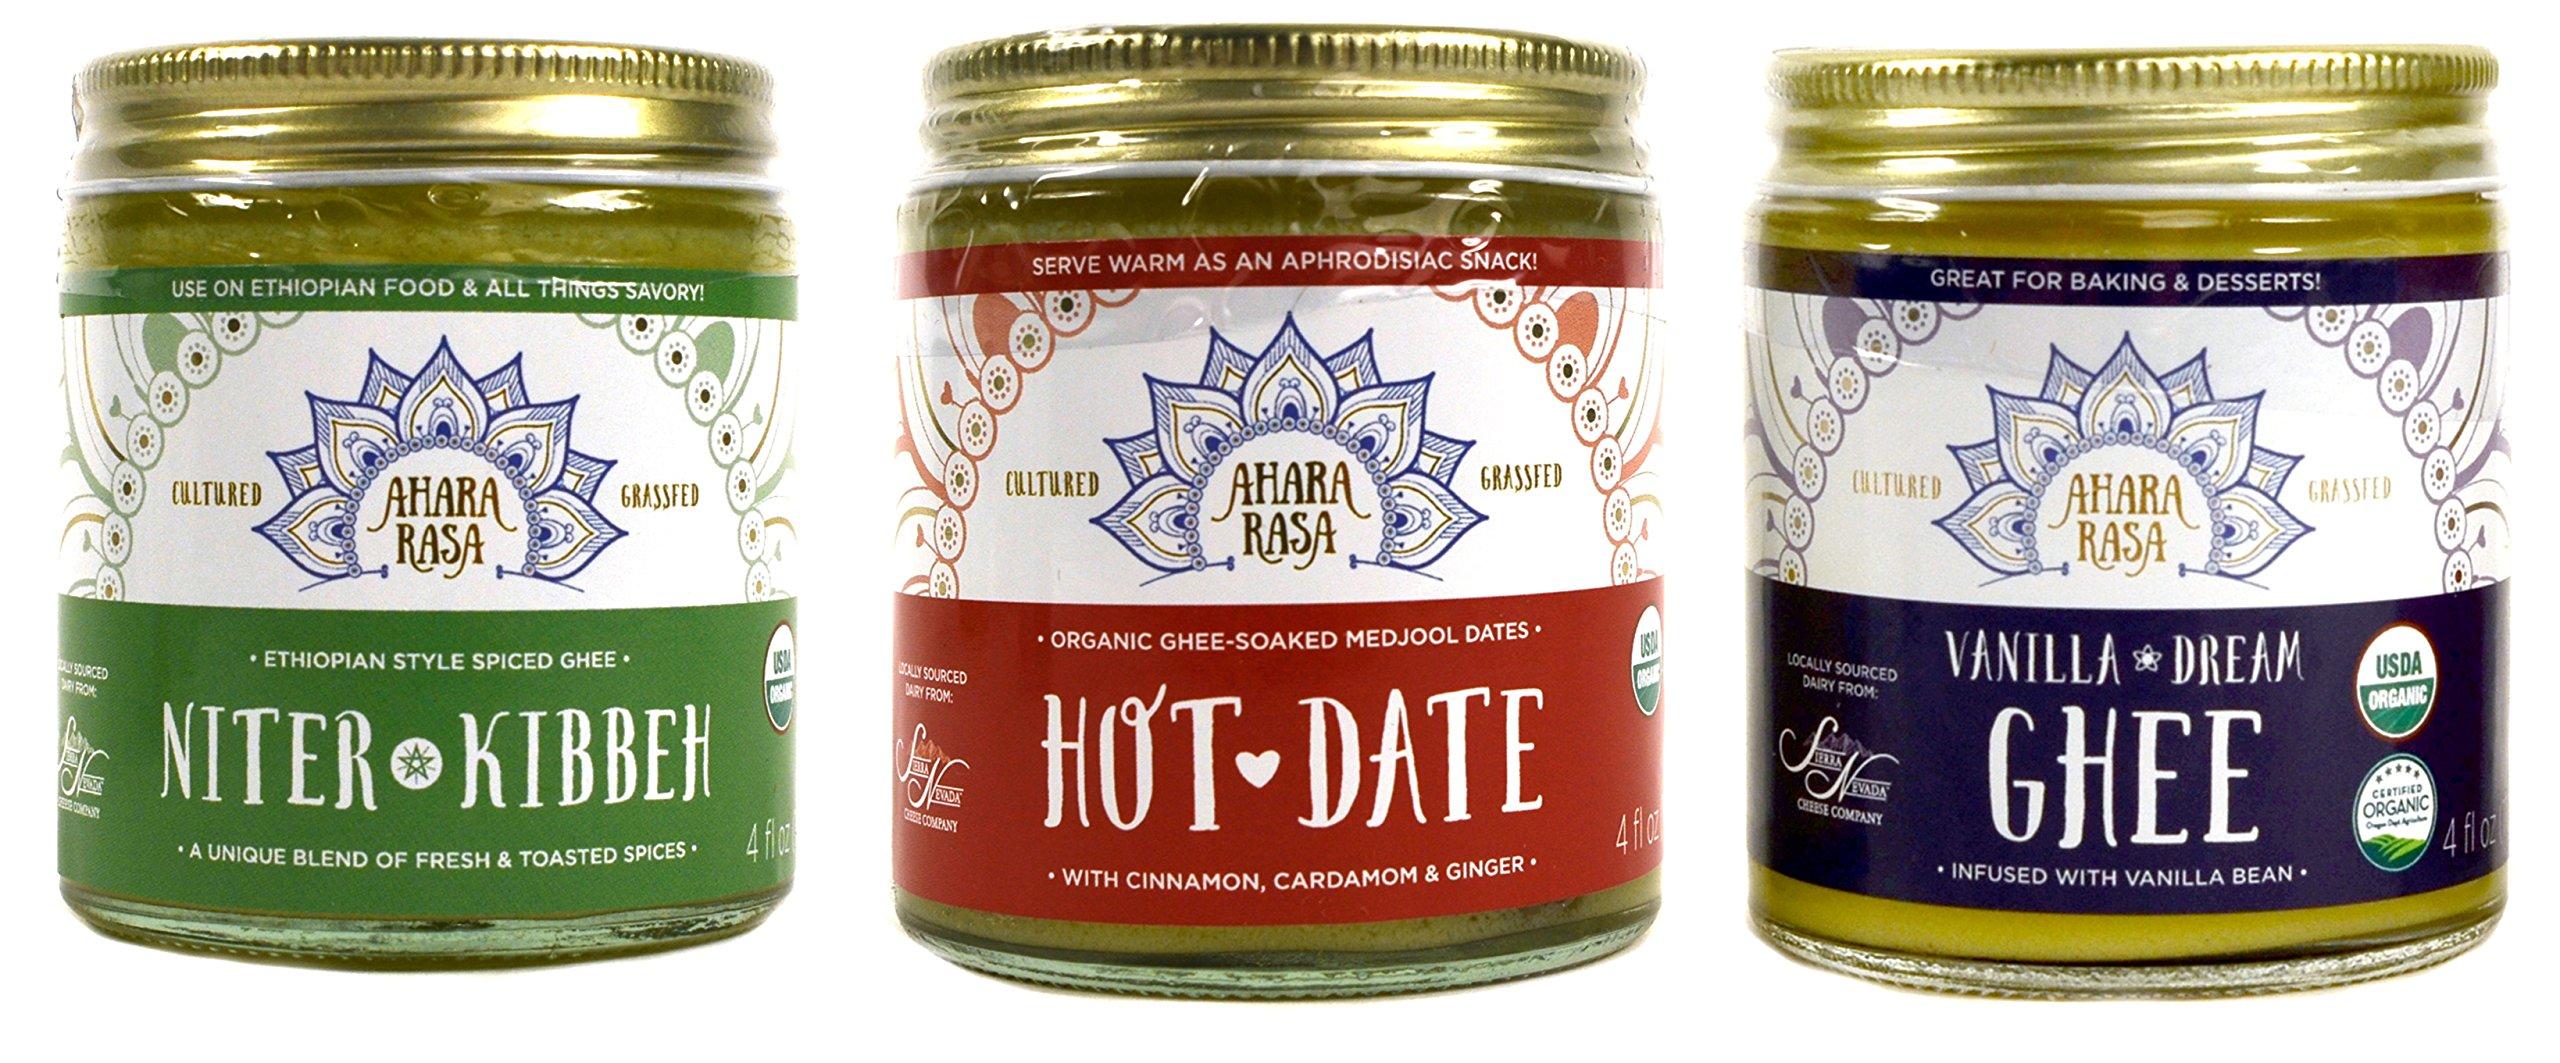 Organic Ghee Sampler - Vanilla, Hot Date (Cardamon & Medjool Dates), Niter Kibbeh (Ethiopian Spices) - Grass-Fed and Cultured - (4 oz each)